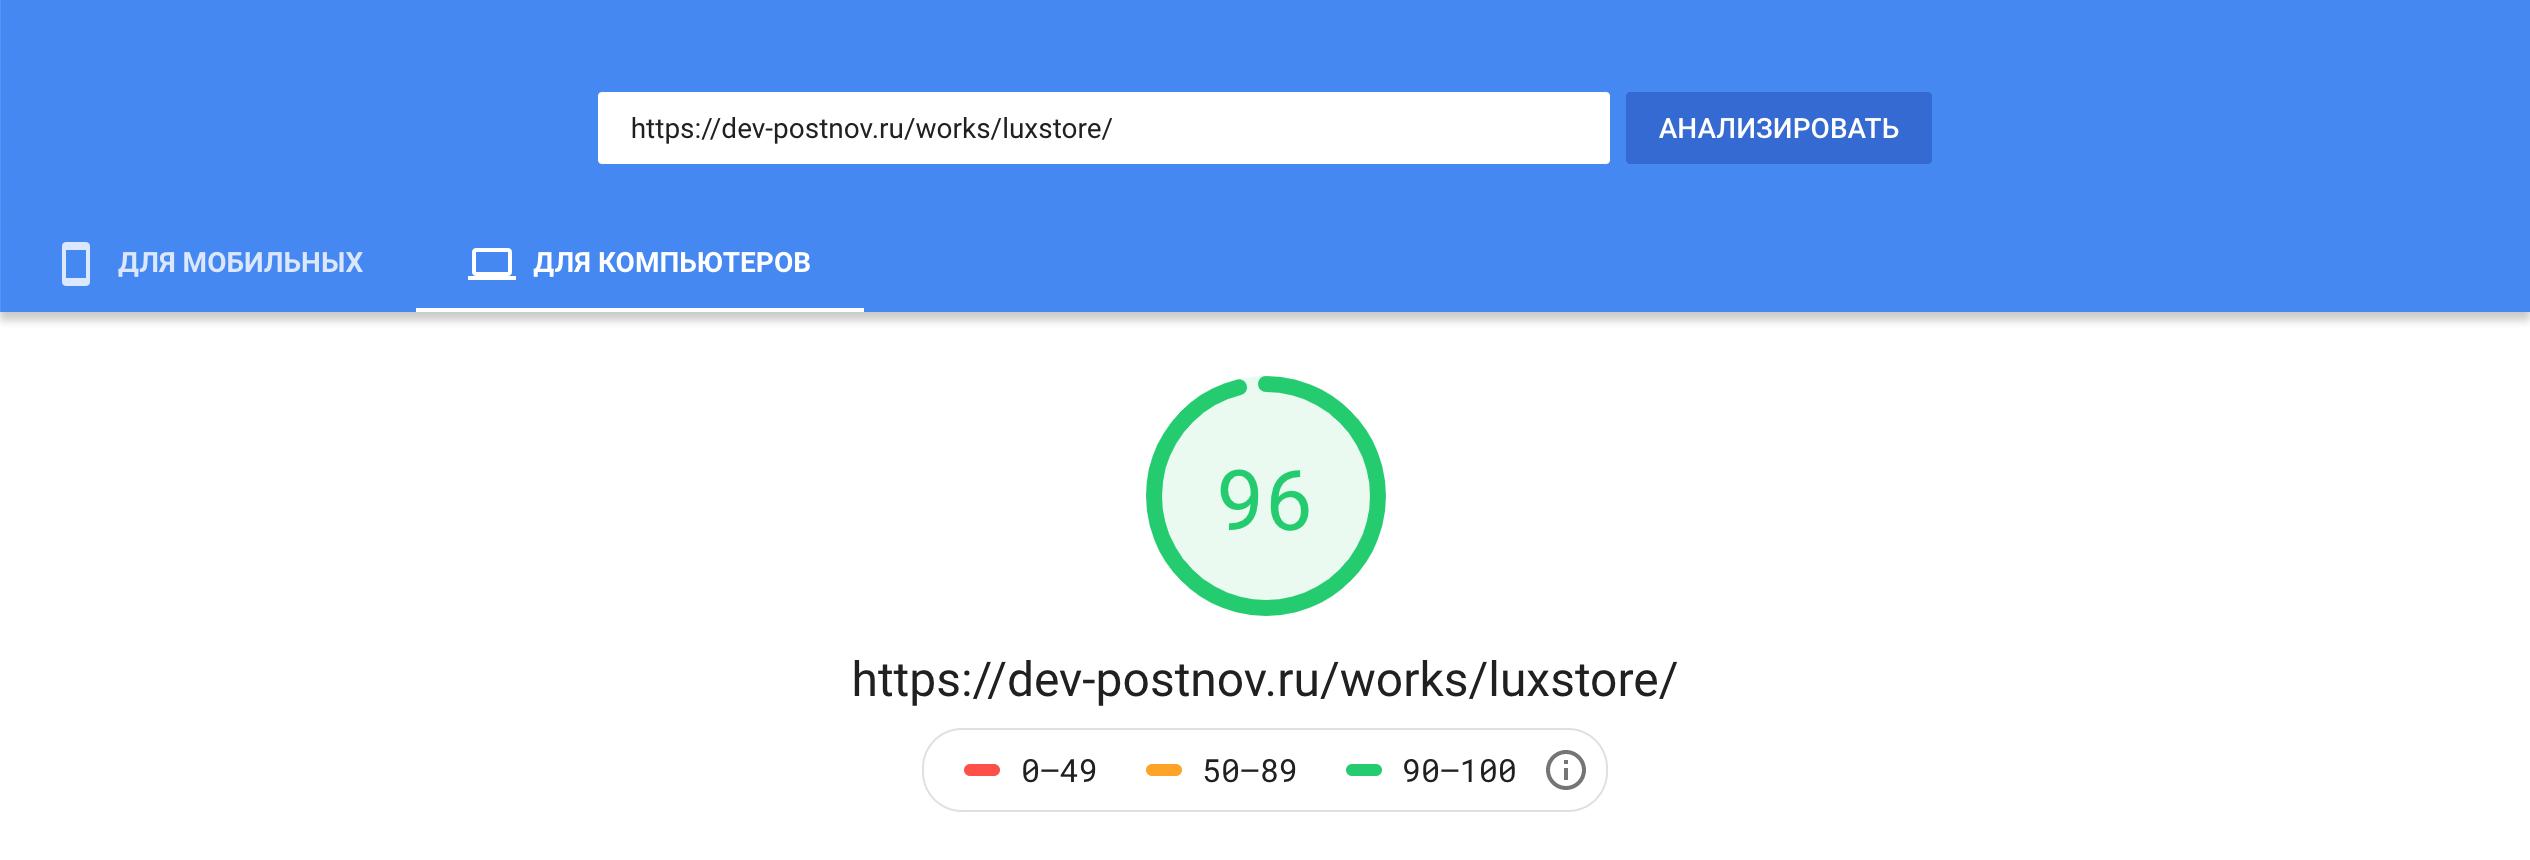 Верстка сайта Luxstore 1